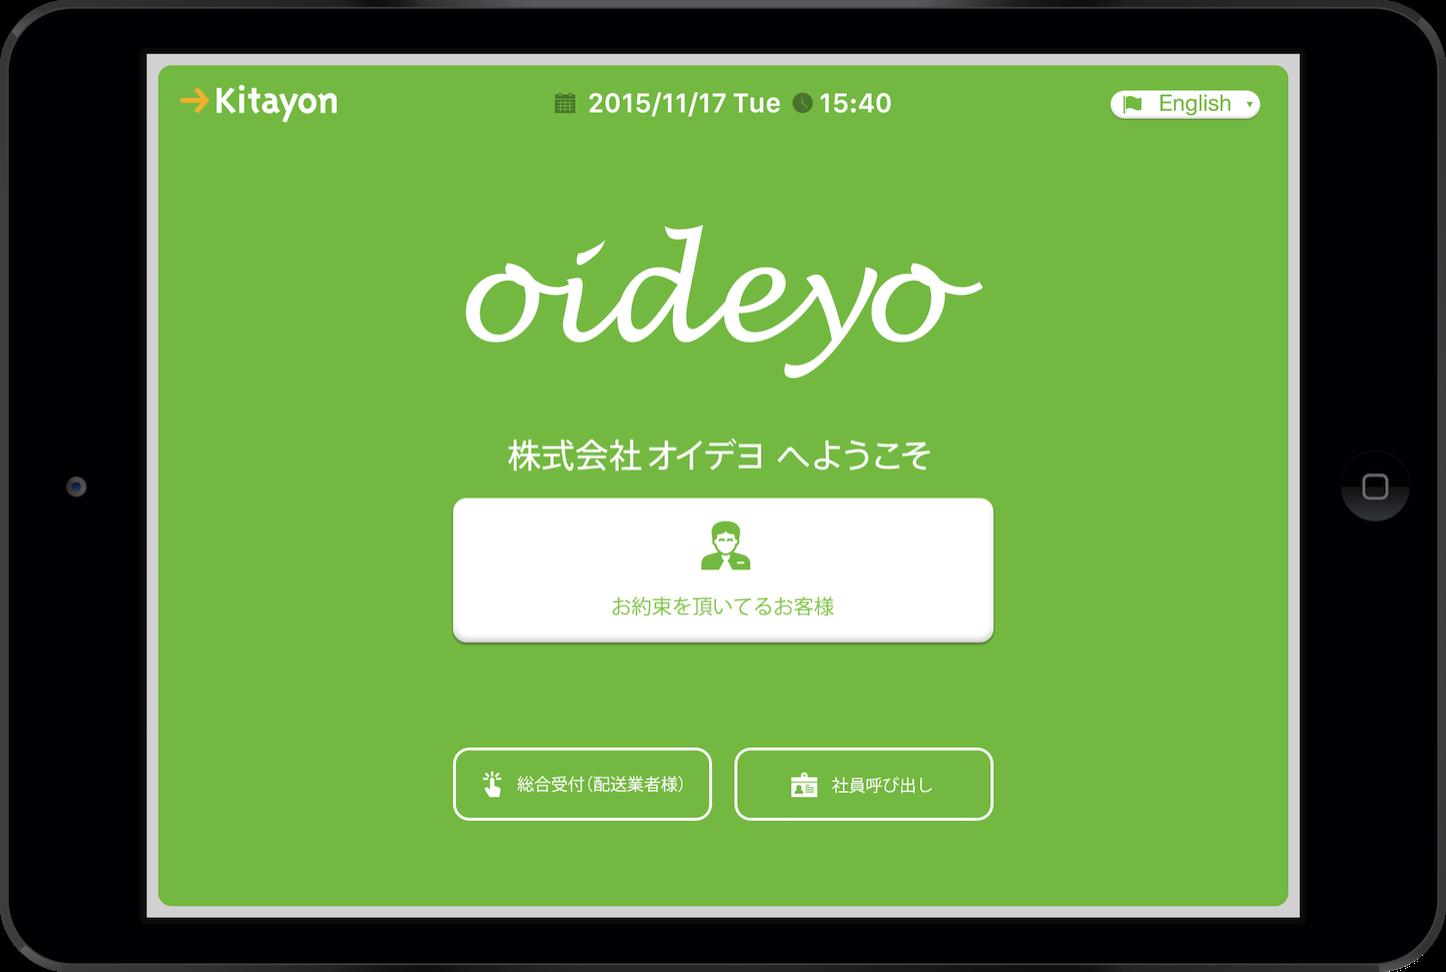 Kitayon(キタヨン)